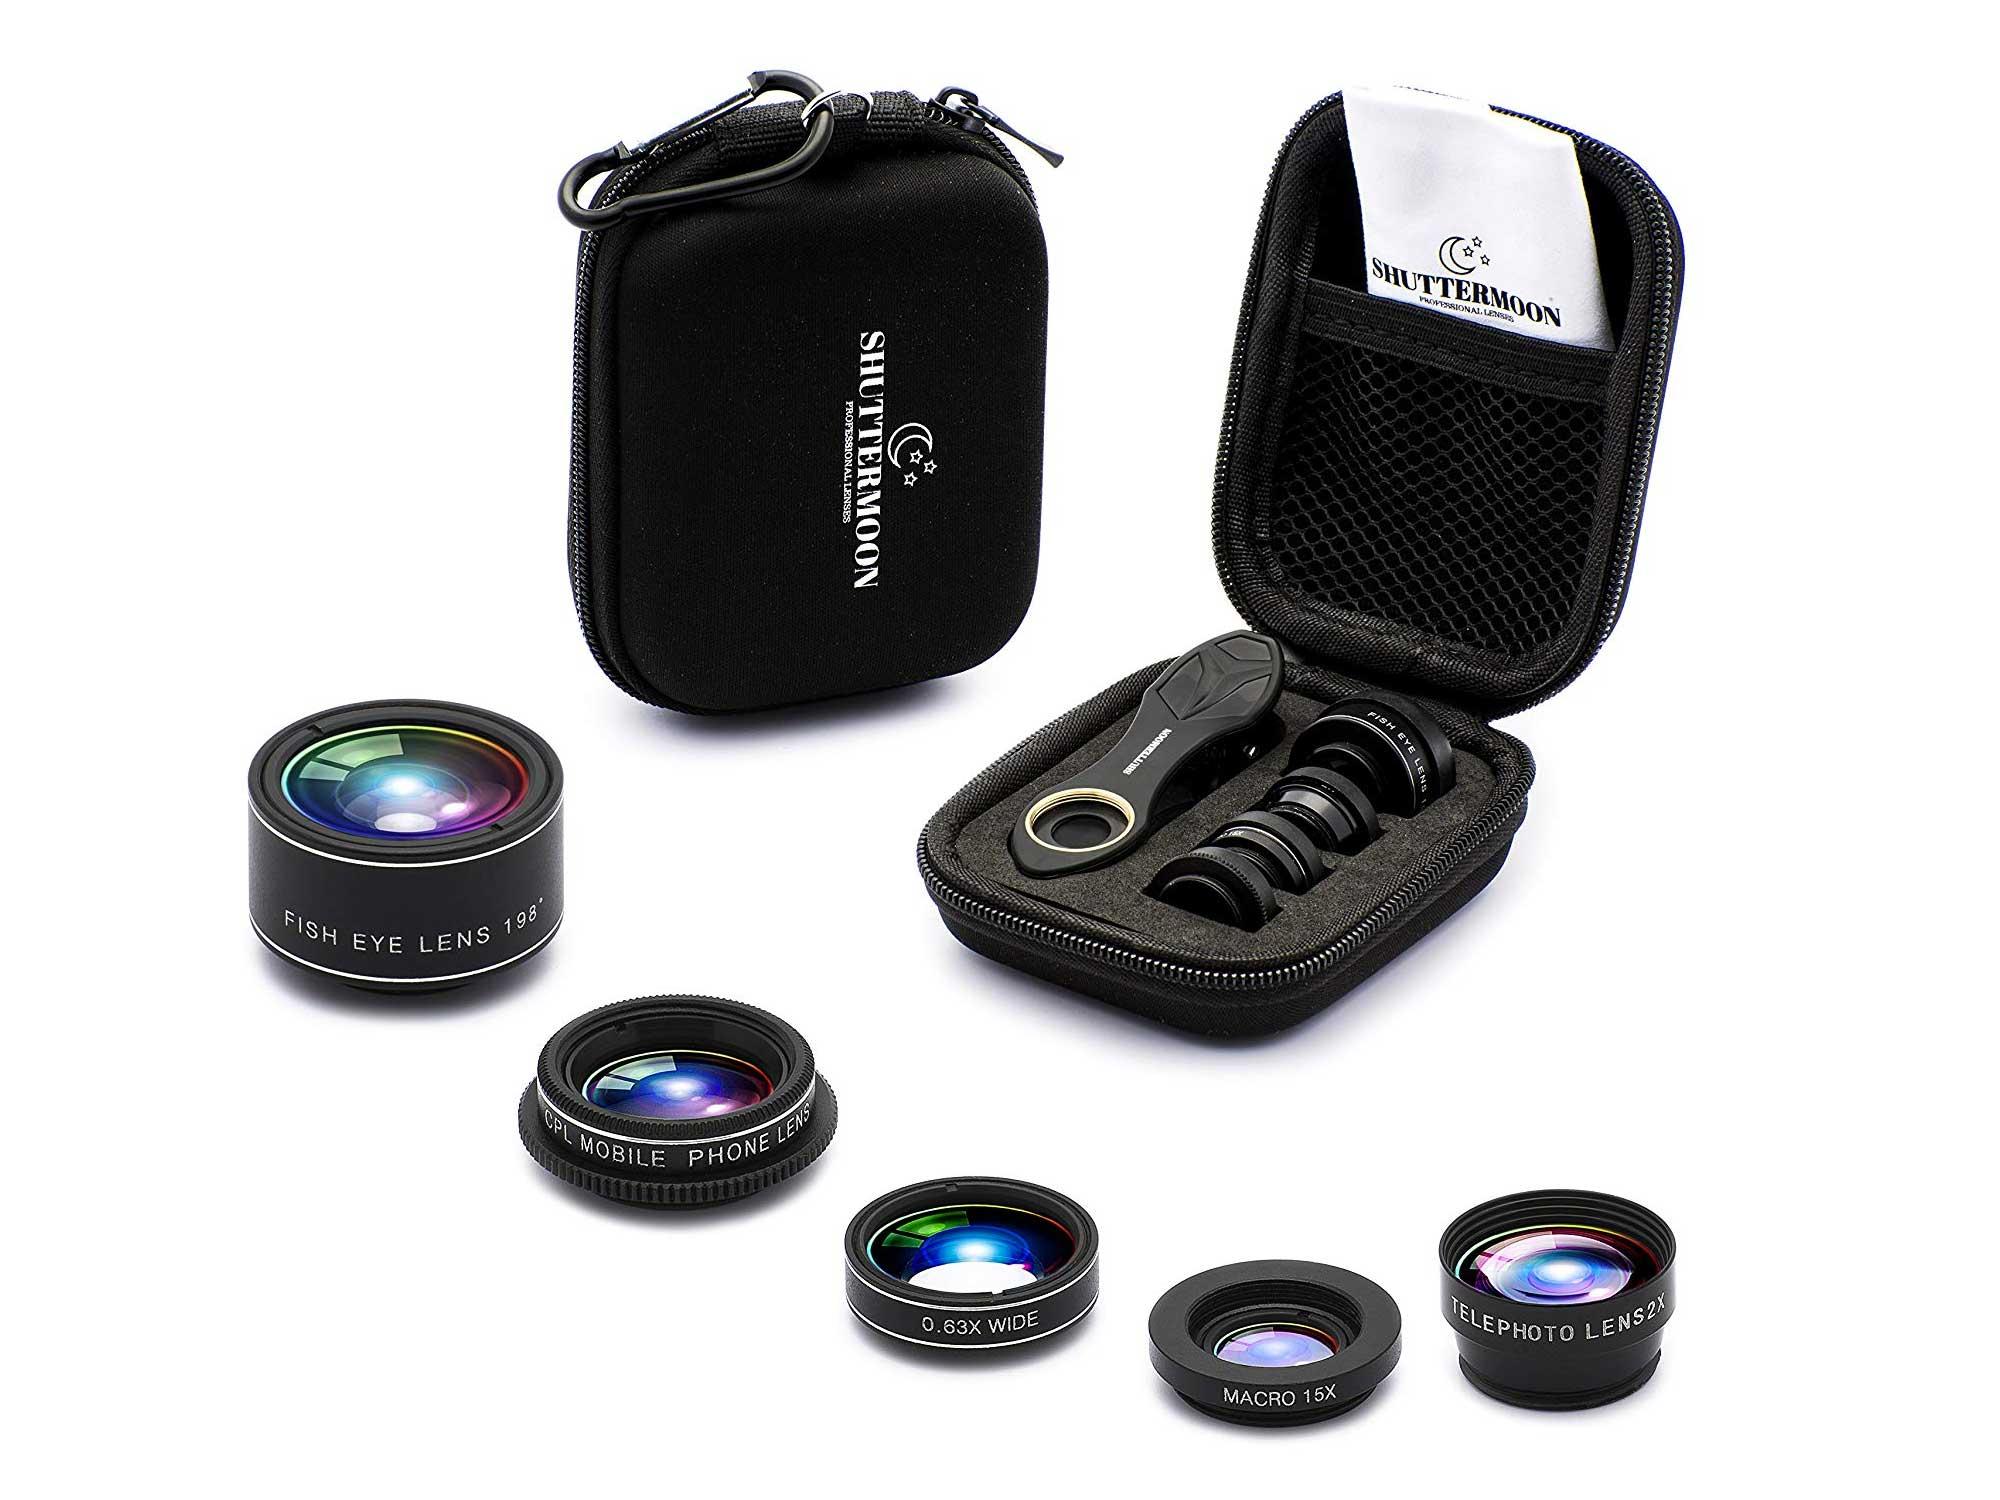 Shuttermoon smartphone lens